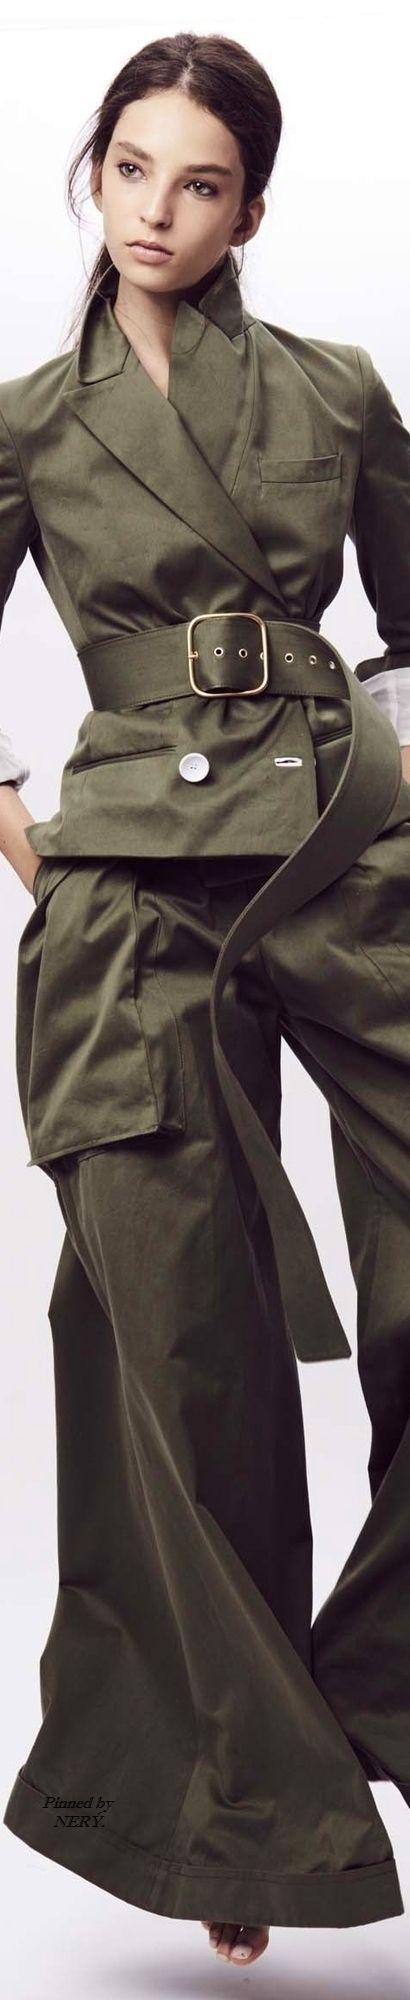 510 Best Olive Moss Kaki Style Images On Pinterest Green Palomino Diska Handbag Khaki 288c19e7d56d4db41a7c8d999c5951db 4102000 Pixel